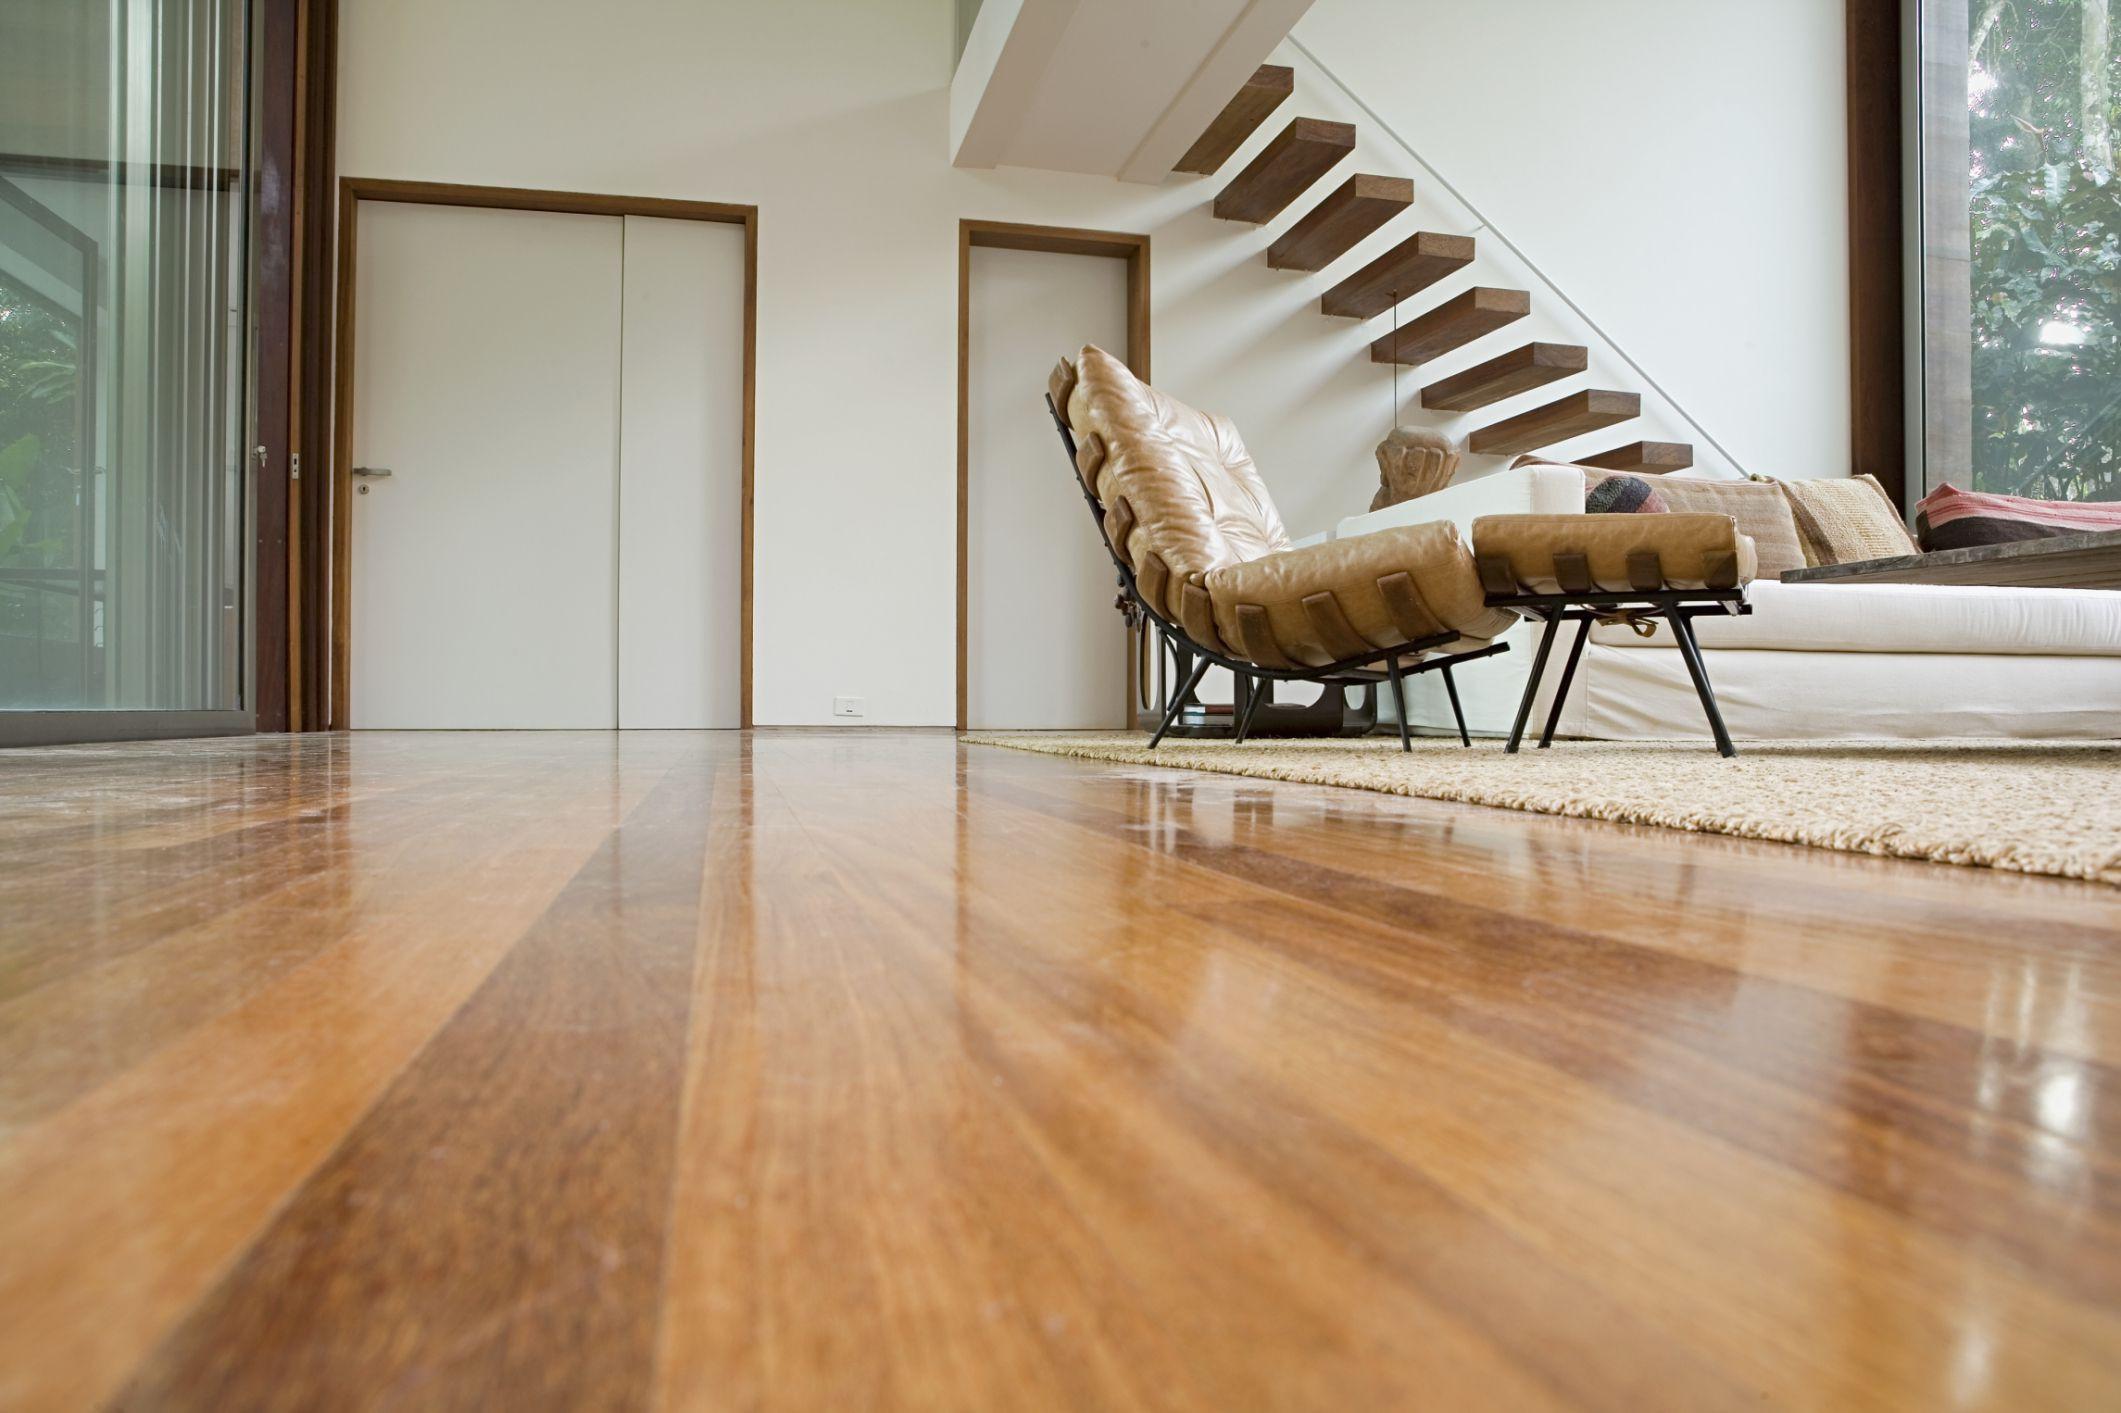 high quality laminate flooring vs hardwood of engineered wood flooring vs solid wood flooring regarding 200571260 001 highres 56a49dec5f9b58b7d0d7dc1e